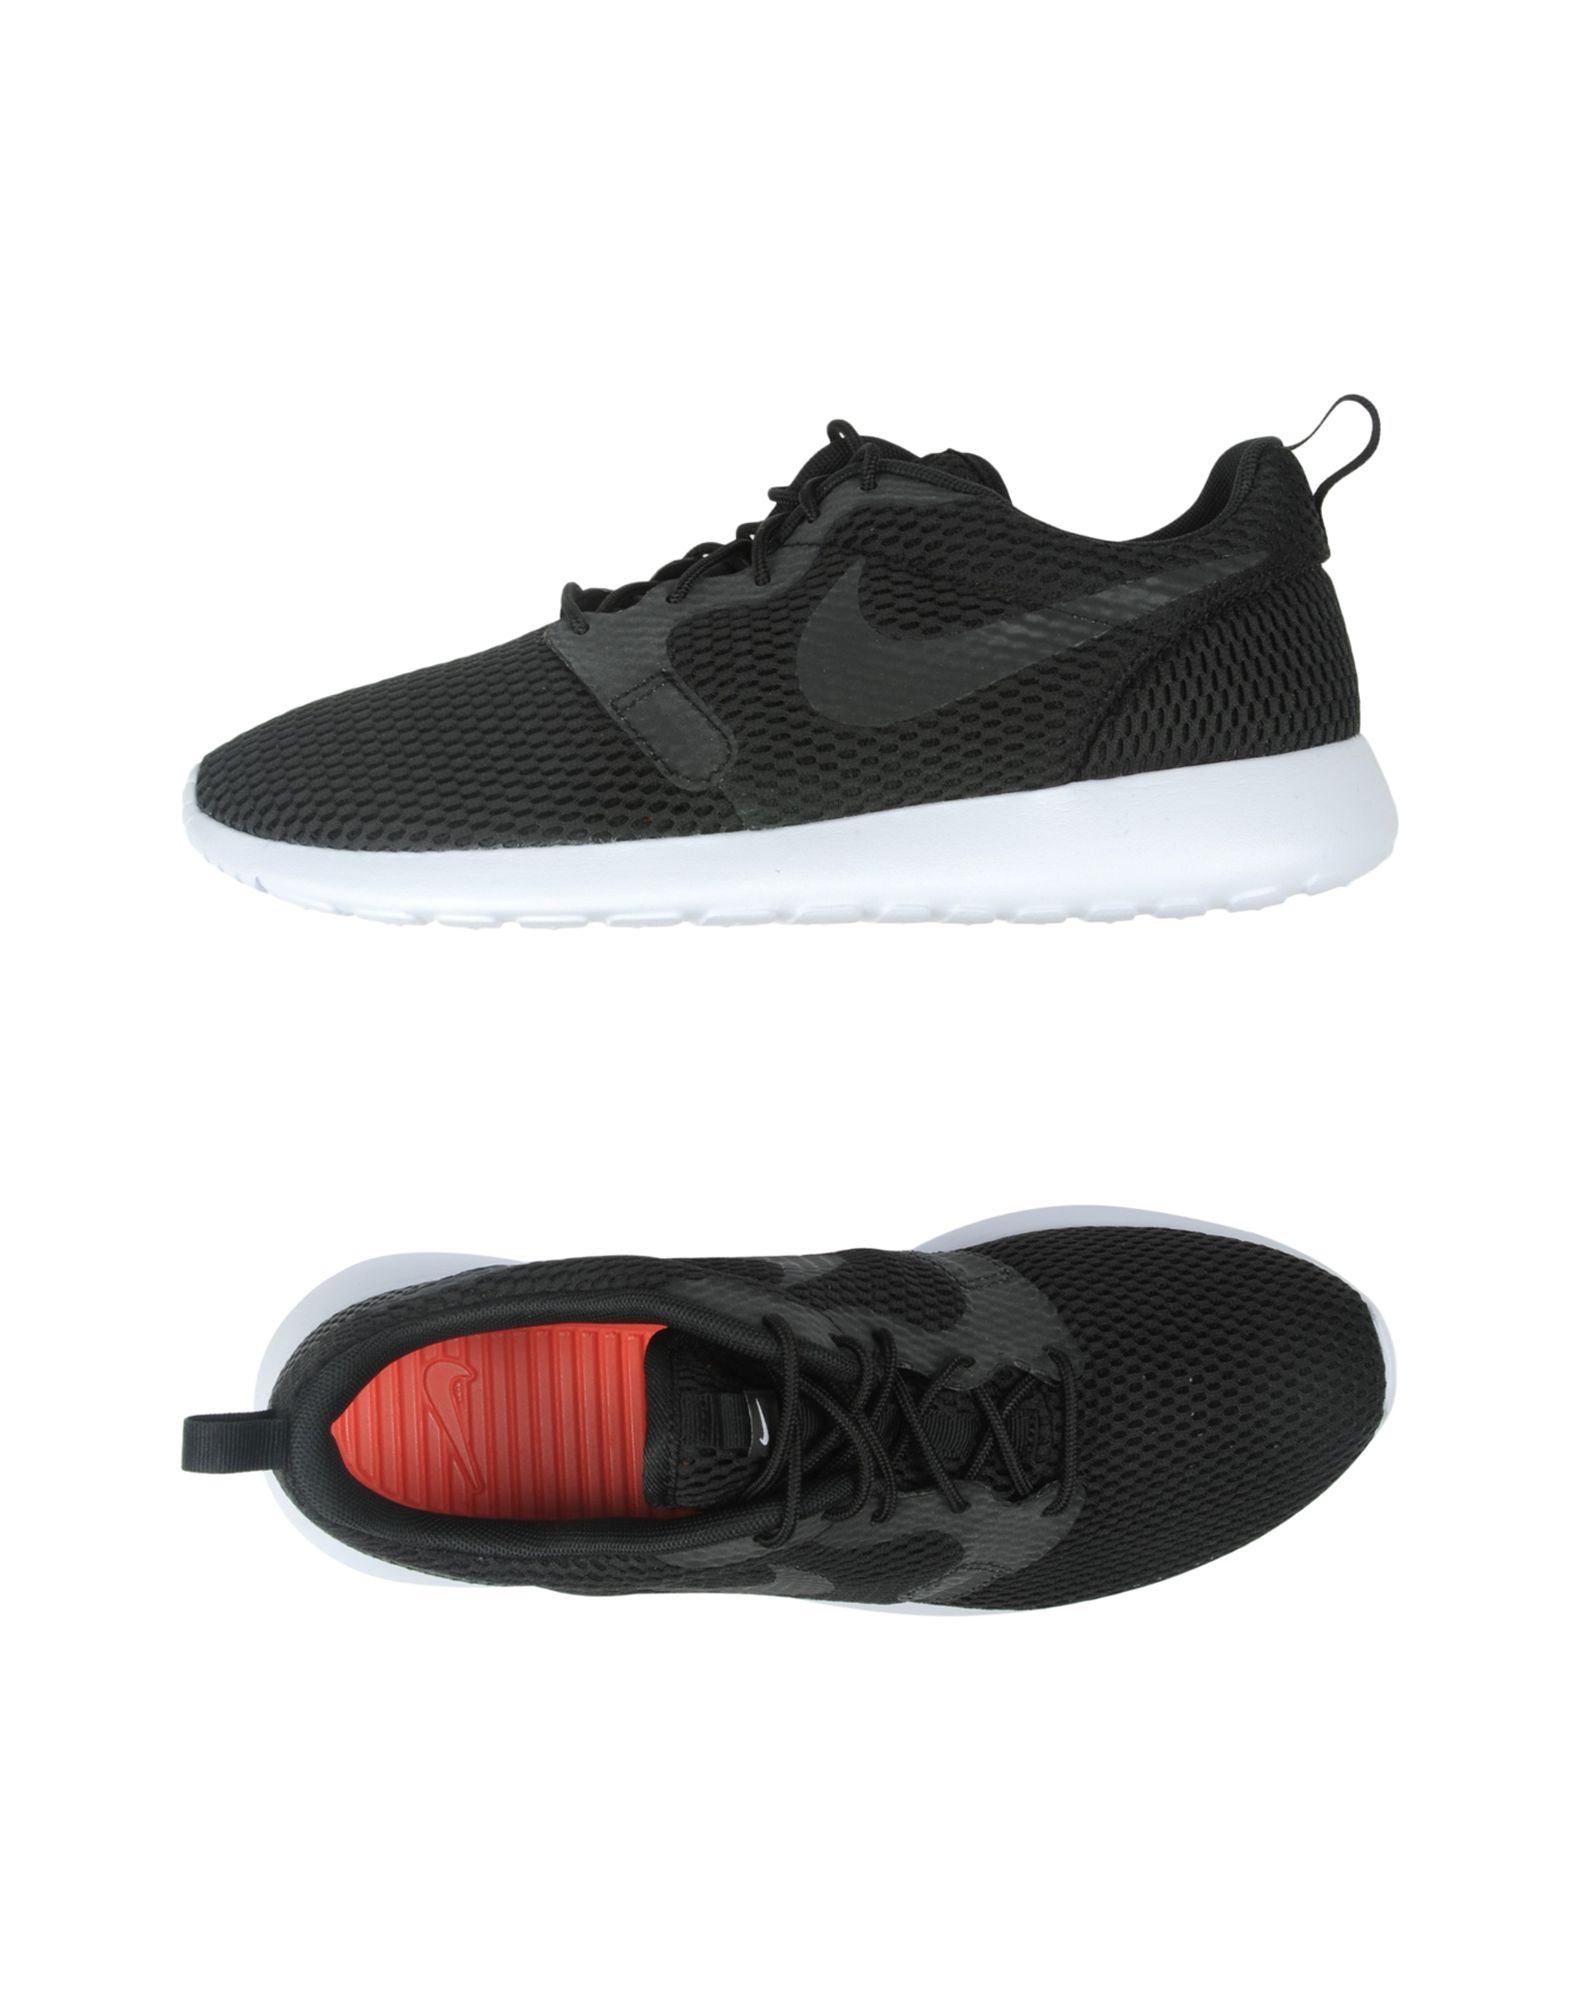 Moda barata y hermosa  Zapatillas Nike Nike Roshe One One Roshe Hyp Br - Hombre - Zapatillas Nike 05c0f9